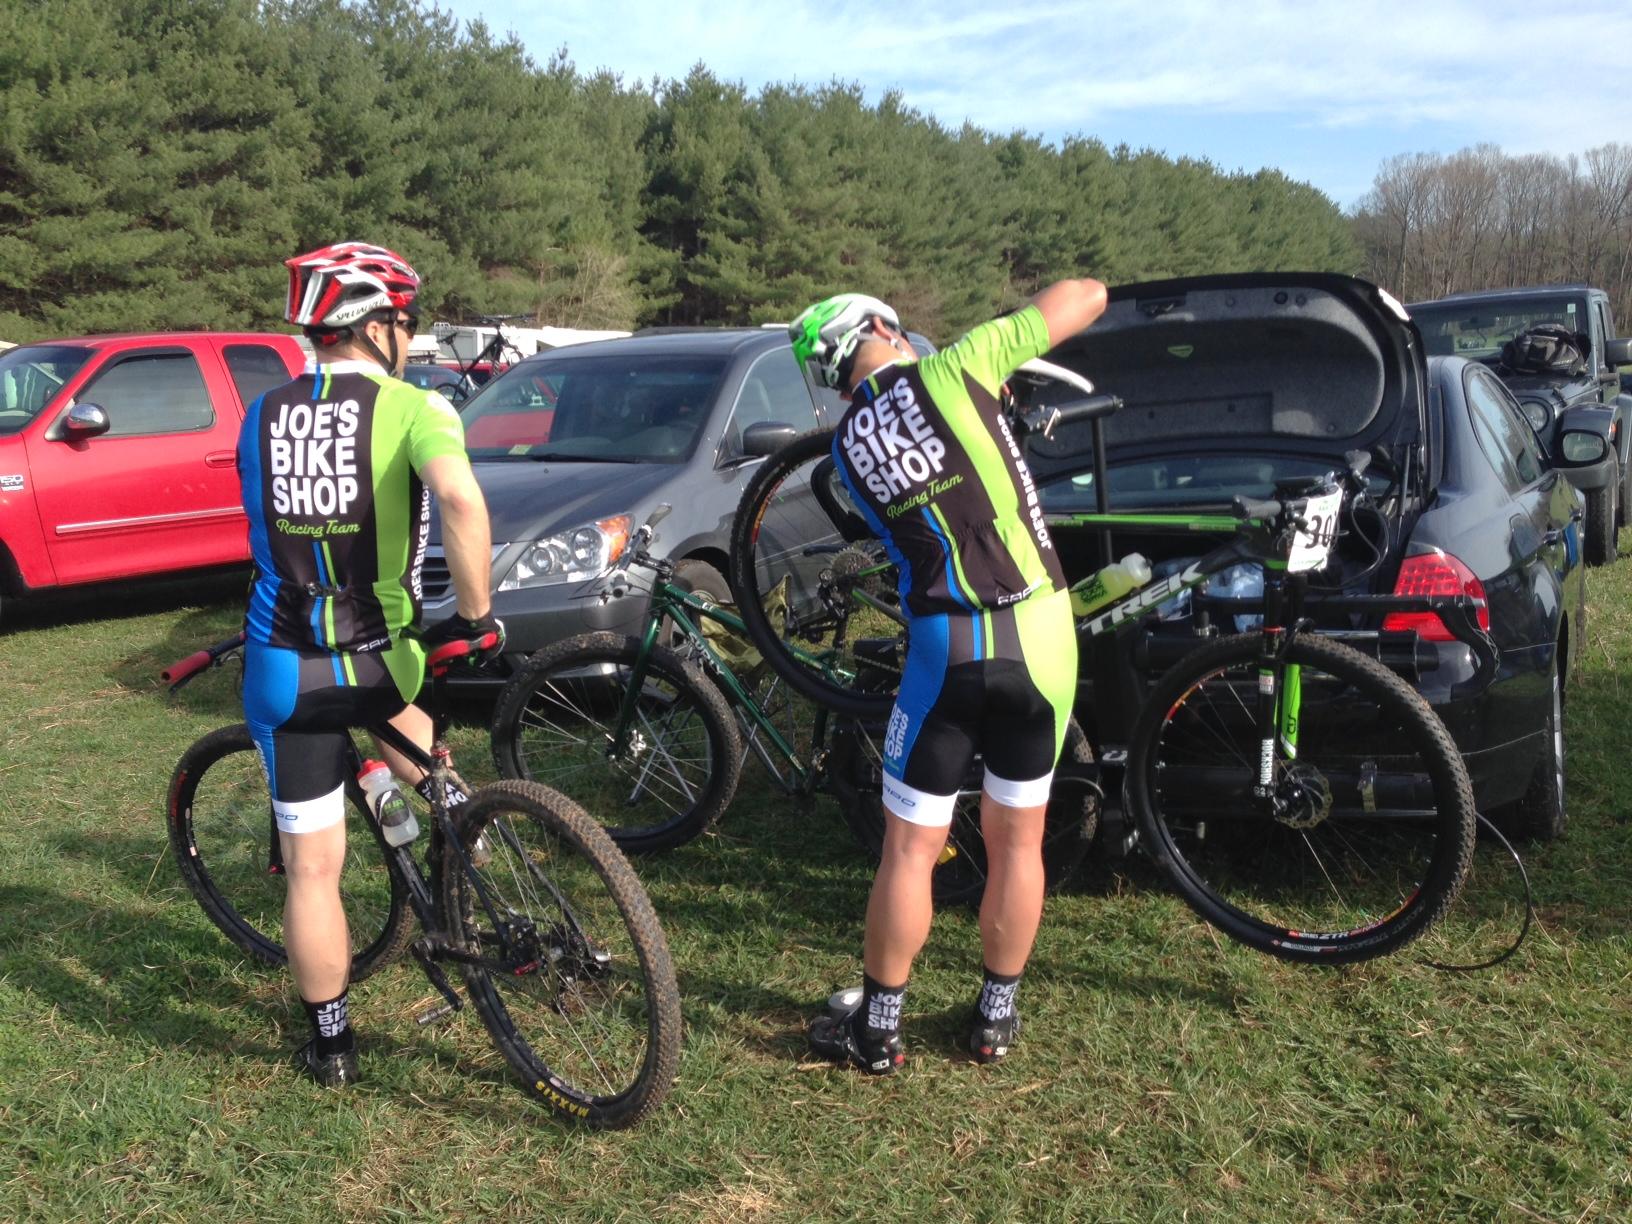 How to Start Racing - Pursue the Podium